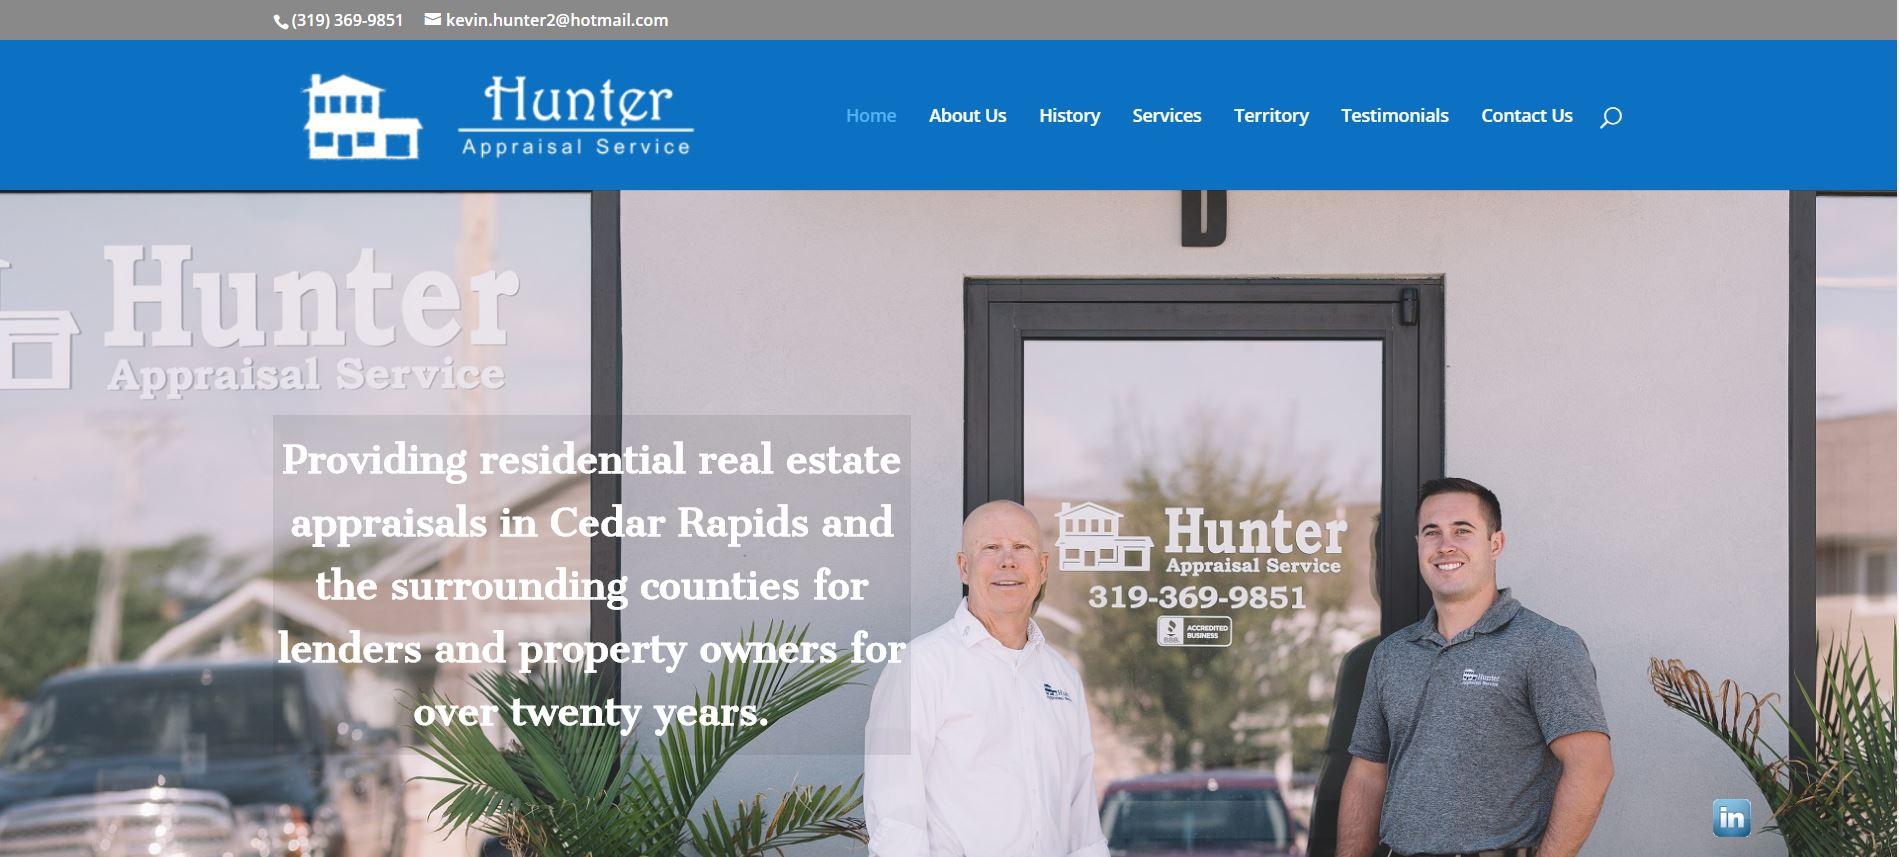 Hunter Appraisal Service